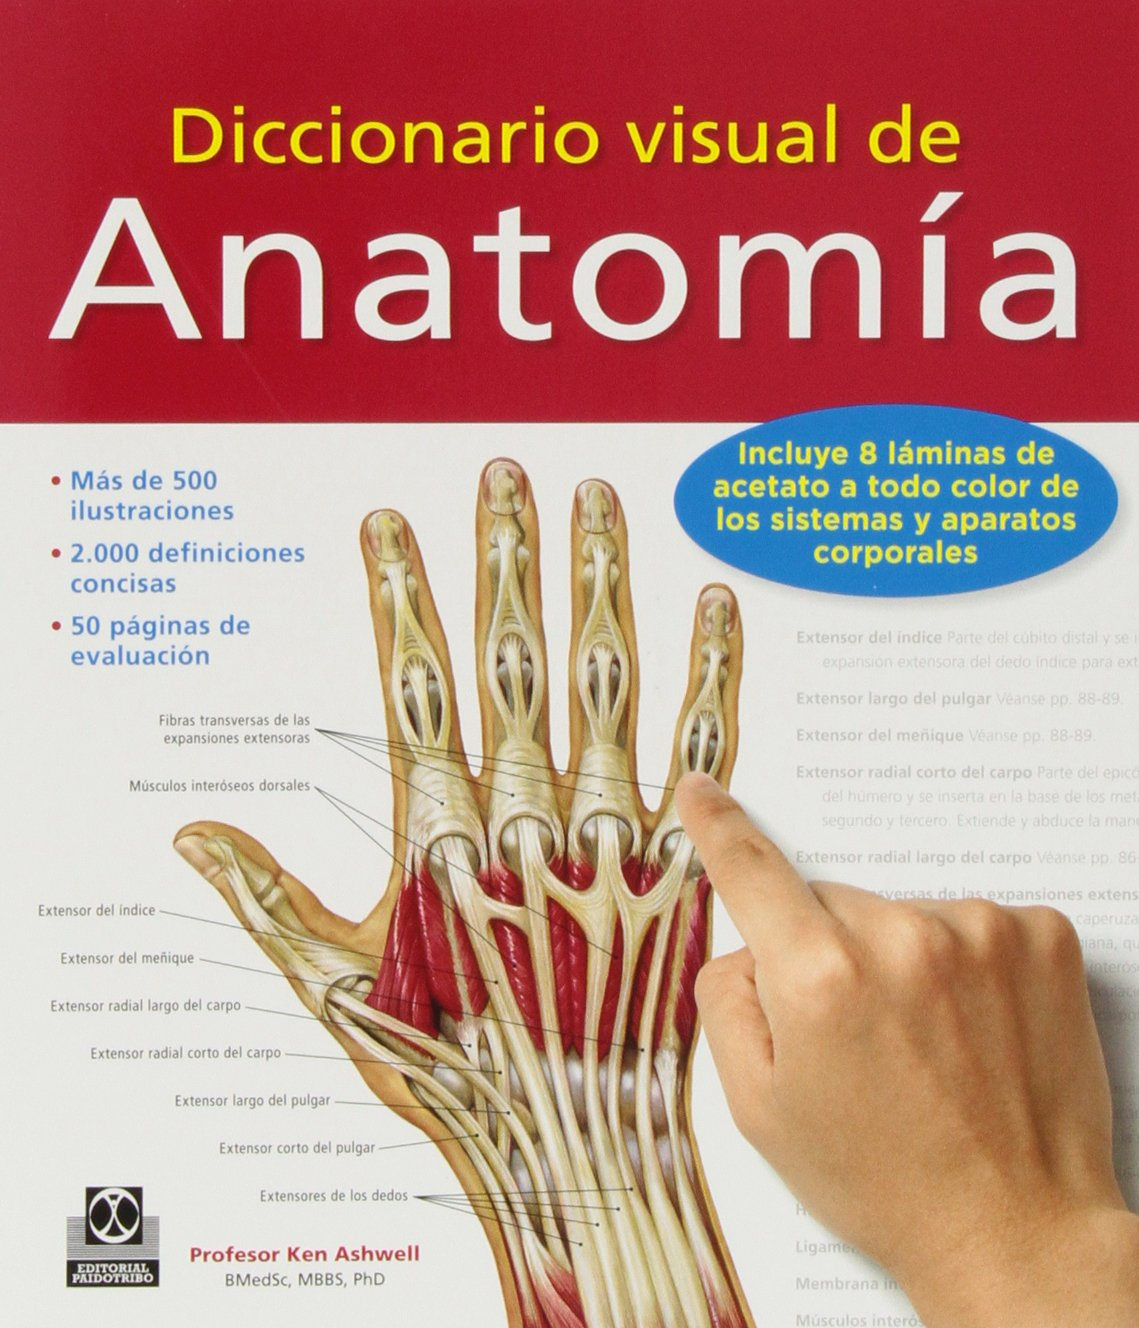 Diccionario visual de Anatomia (Spanish Edition): Ken Aswell ...